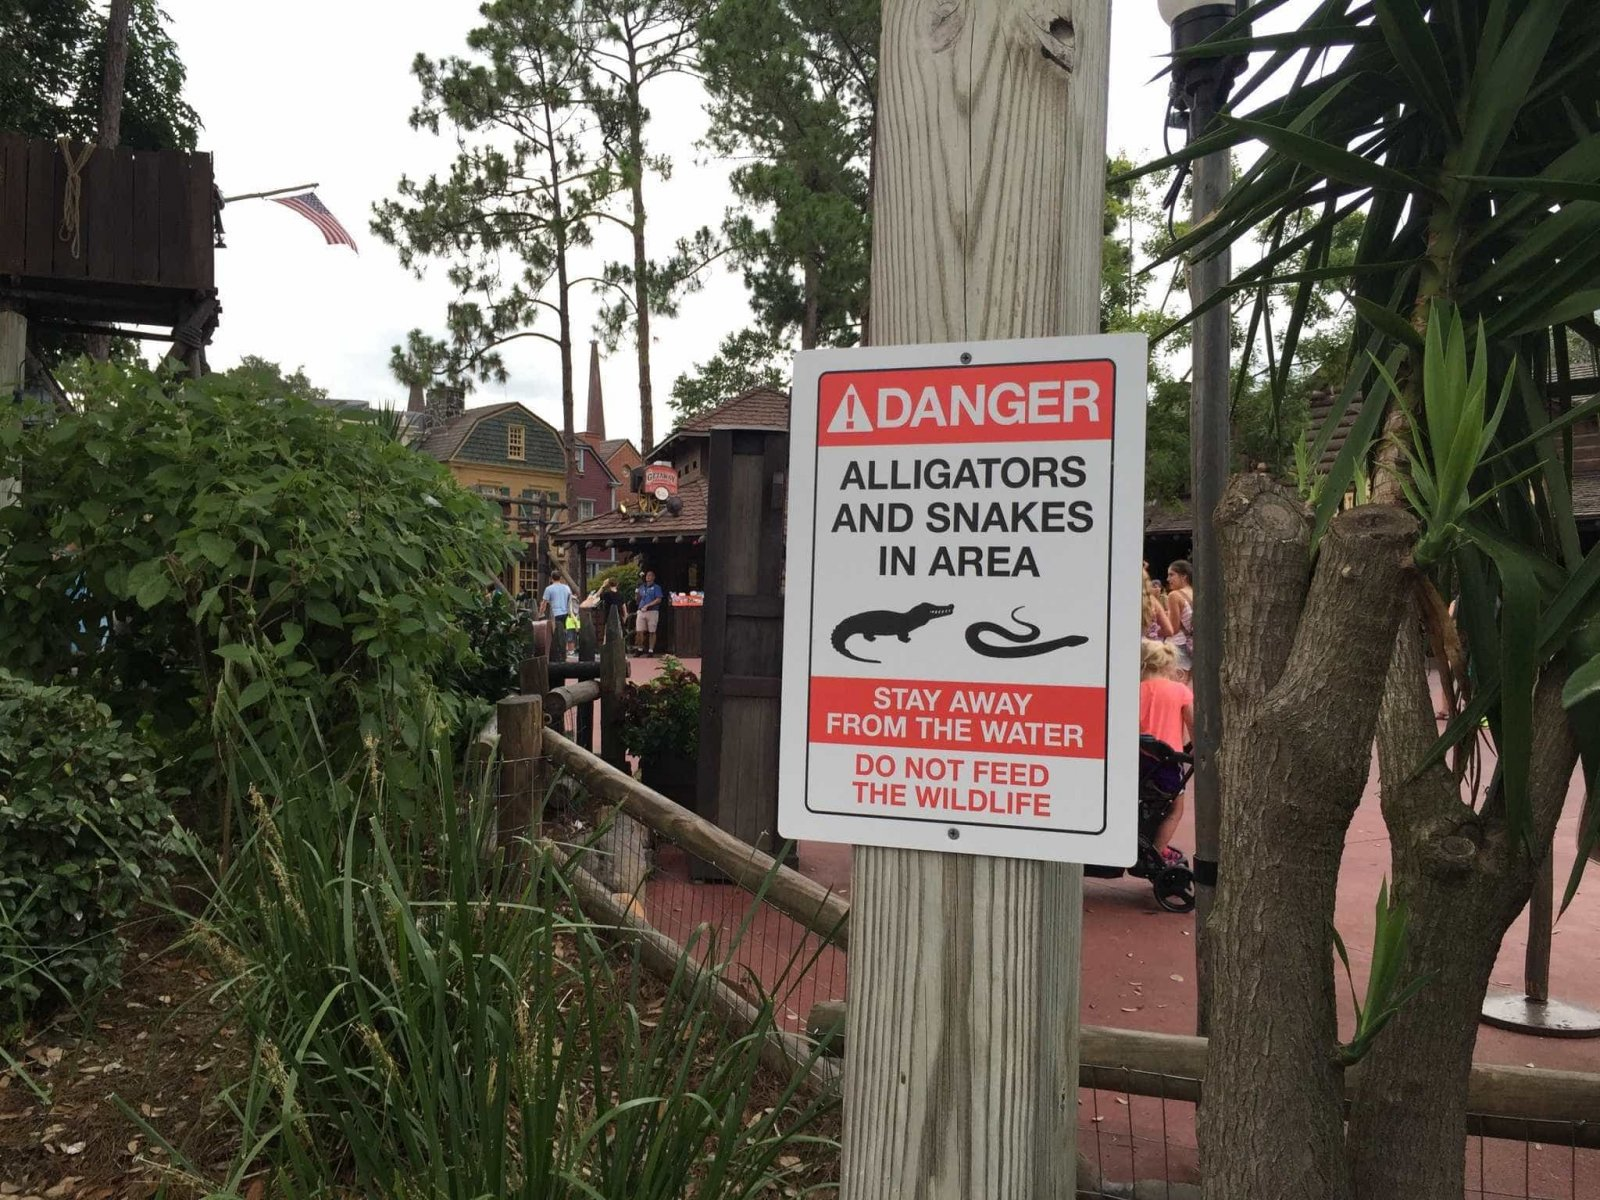 Click image for larger version  Name:Gator warning sign.jpg Views:29 Size:434.4 KB ID:243109